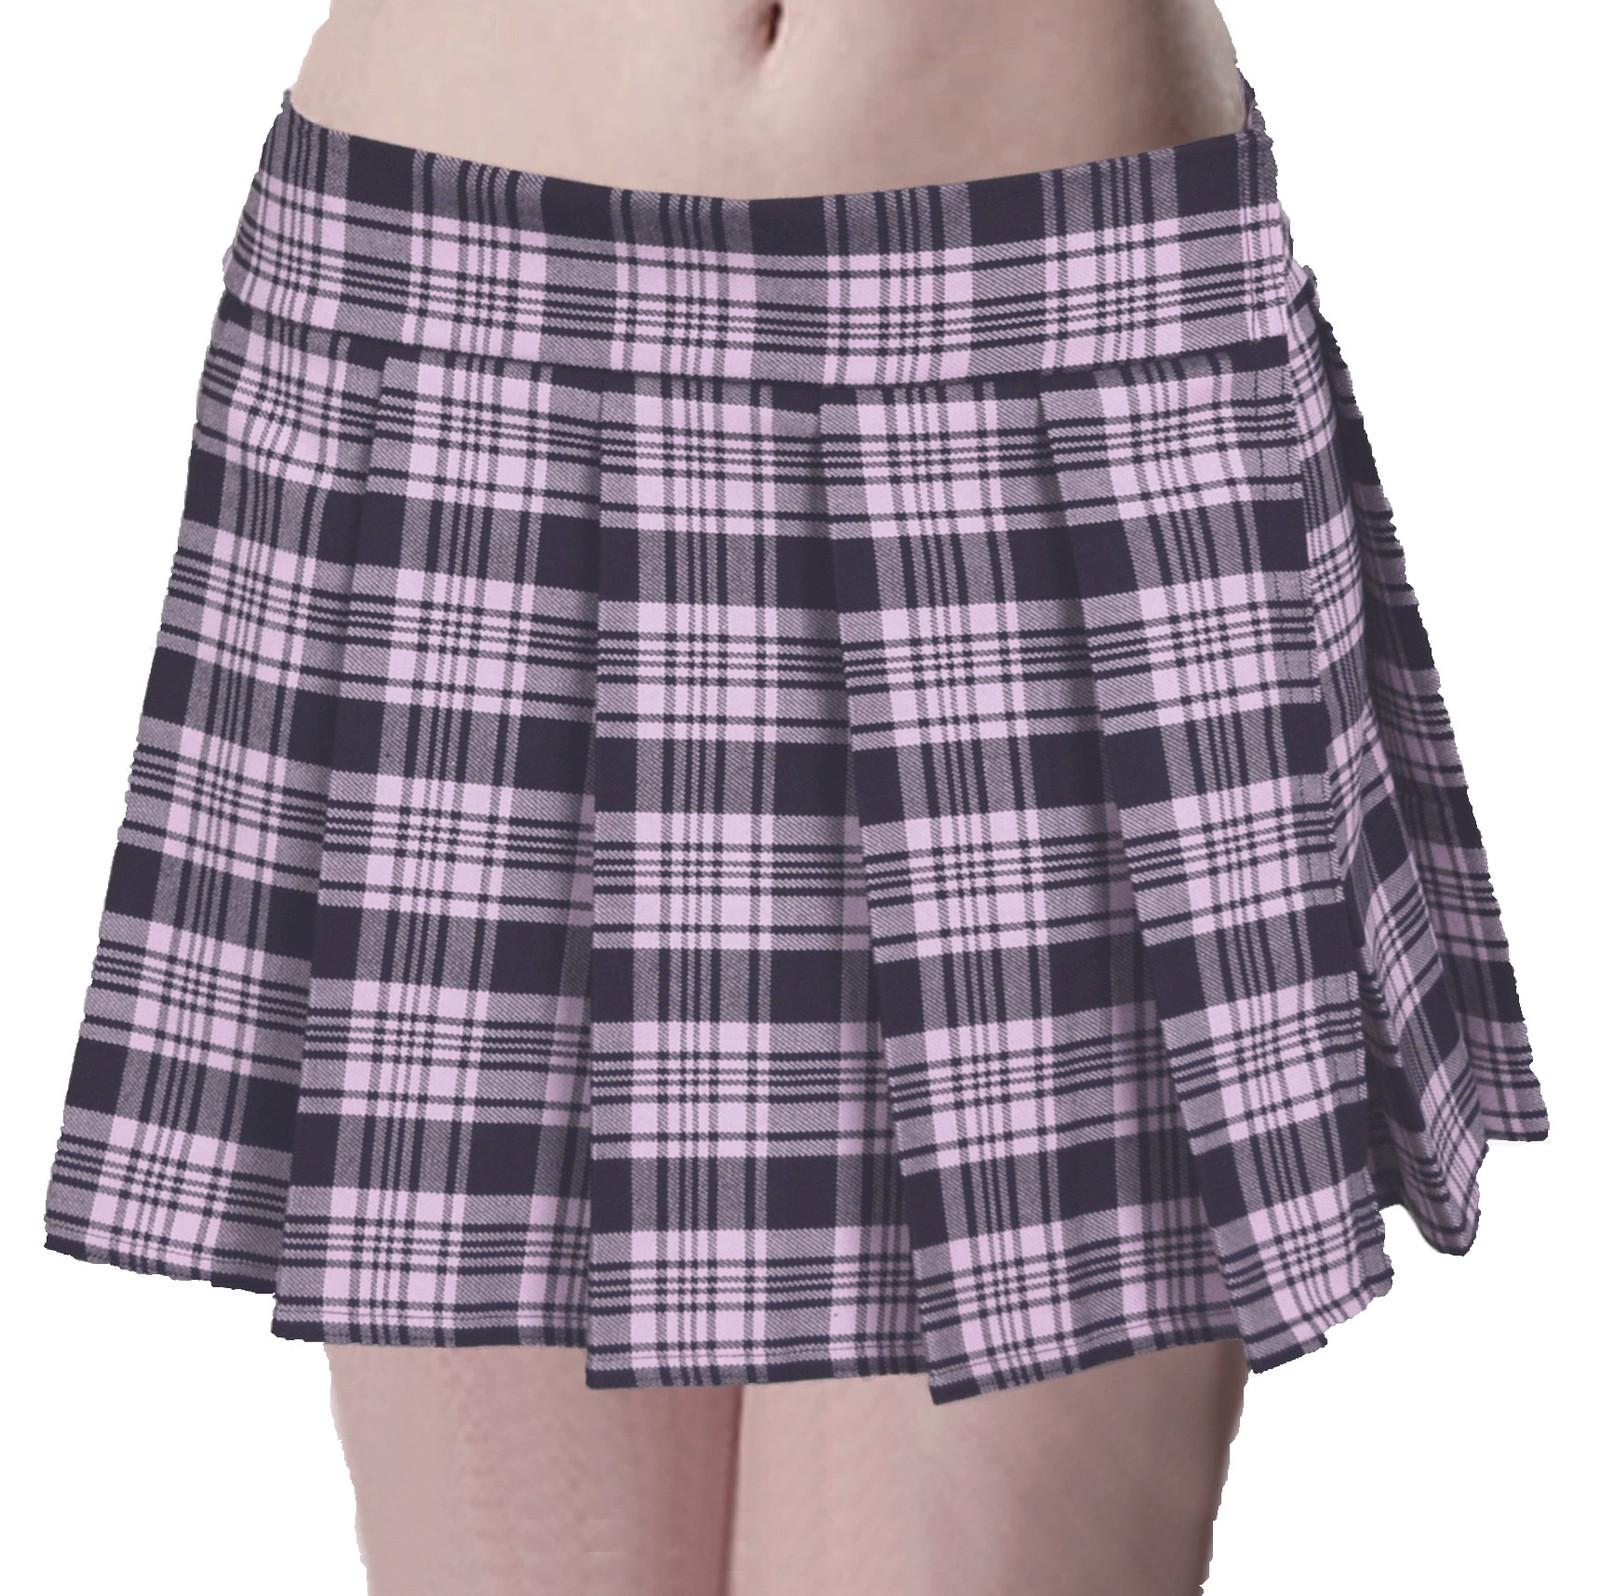 8d758d9b07 Musk PINK/BLACK Schoolgirl Plaid Tartan and 35 similar items